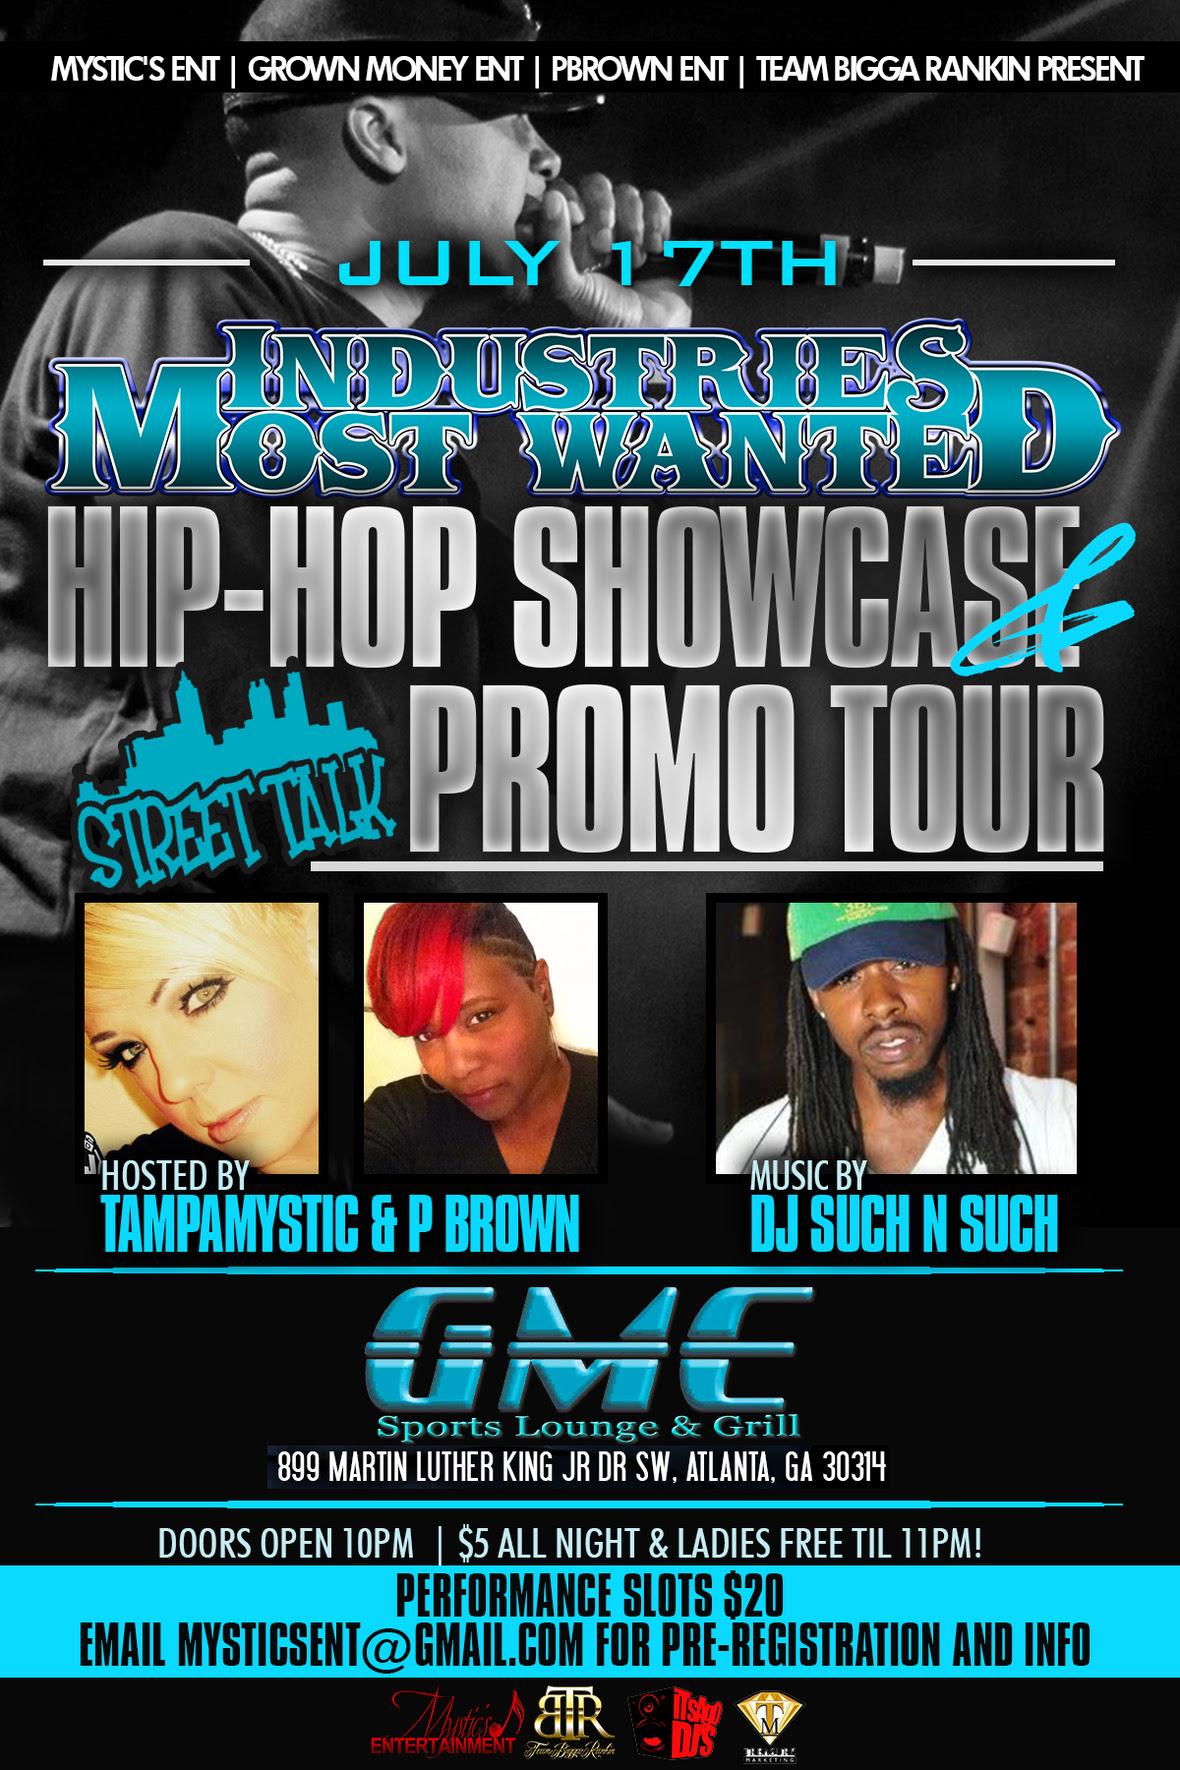 Tampa Mystic - IMW -HIPHOP SHOWCASE 7-17